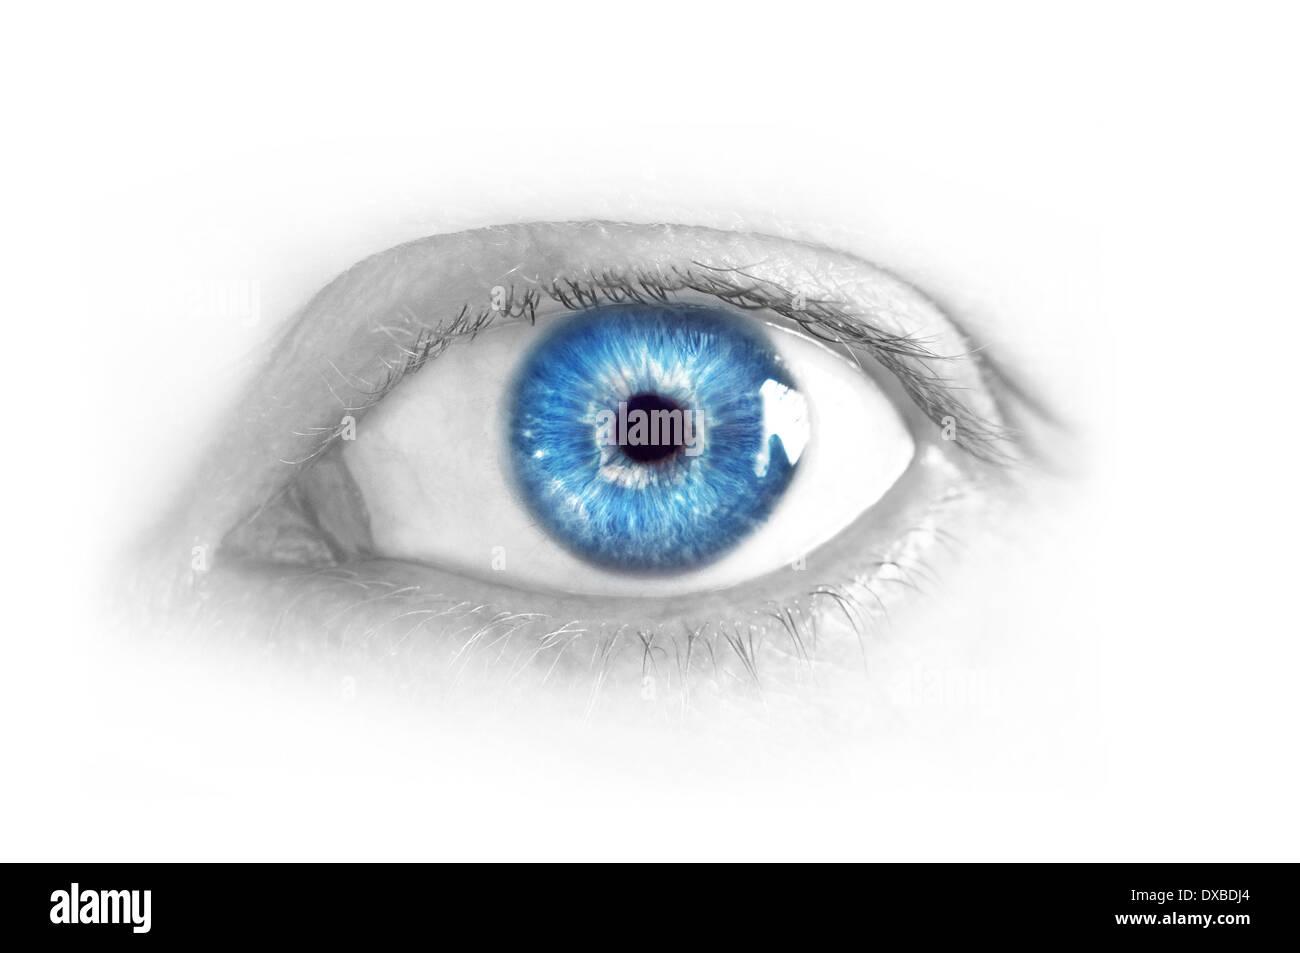 Close Up Of Beautiful Female Blue Eye Without Make Up Stock Photo 67864332 Alamy